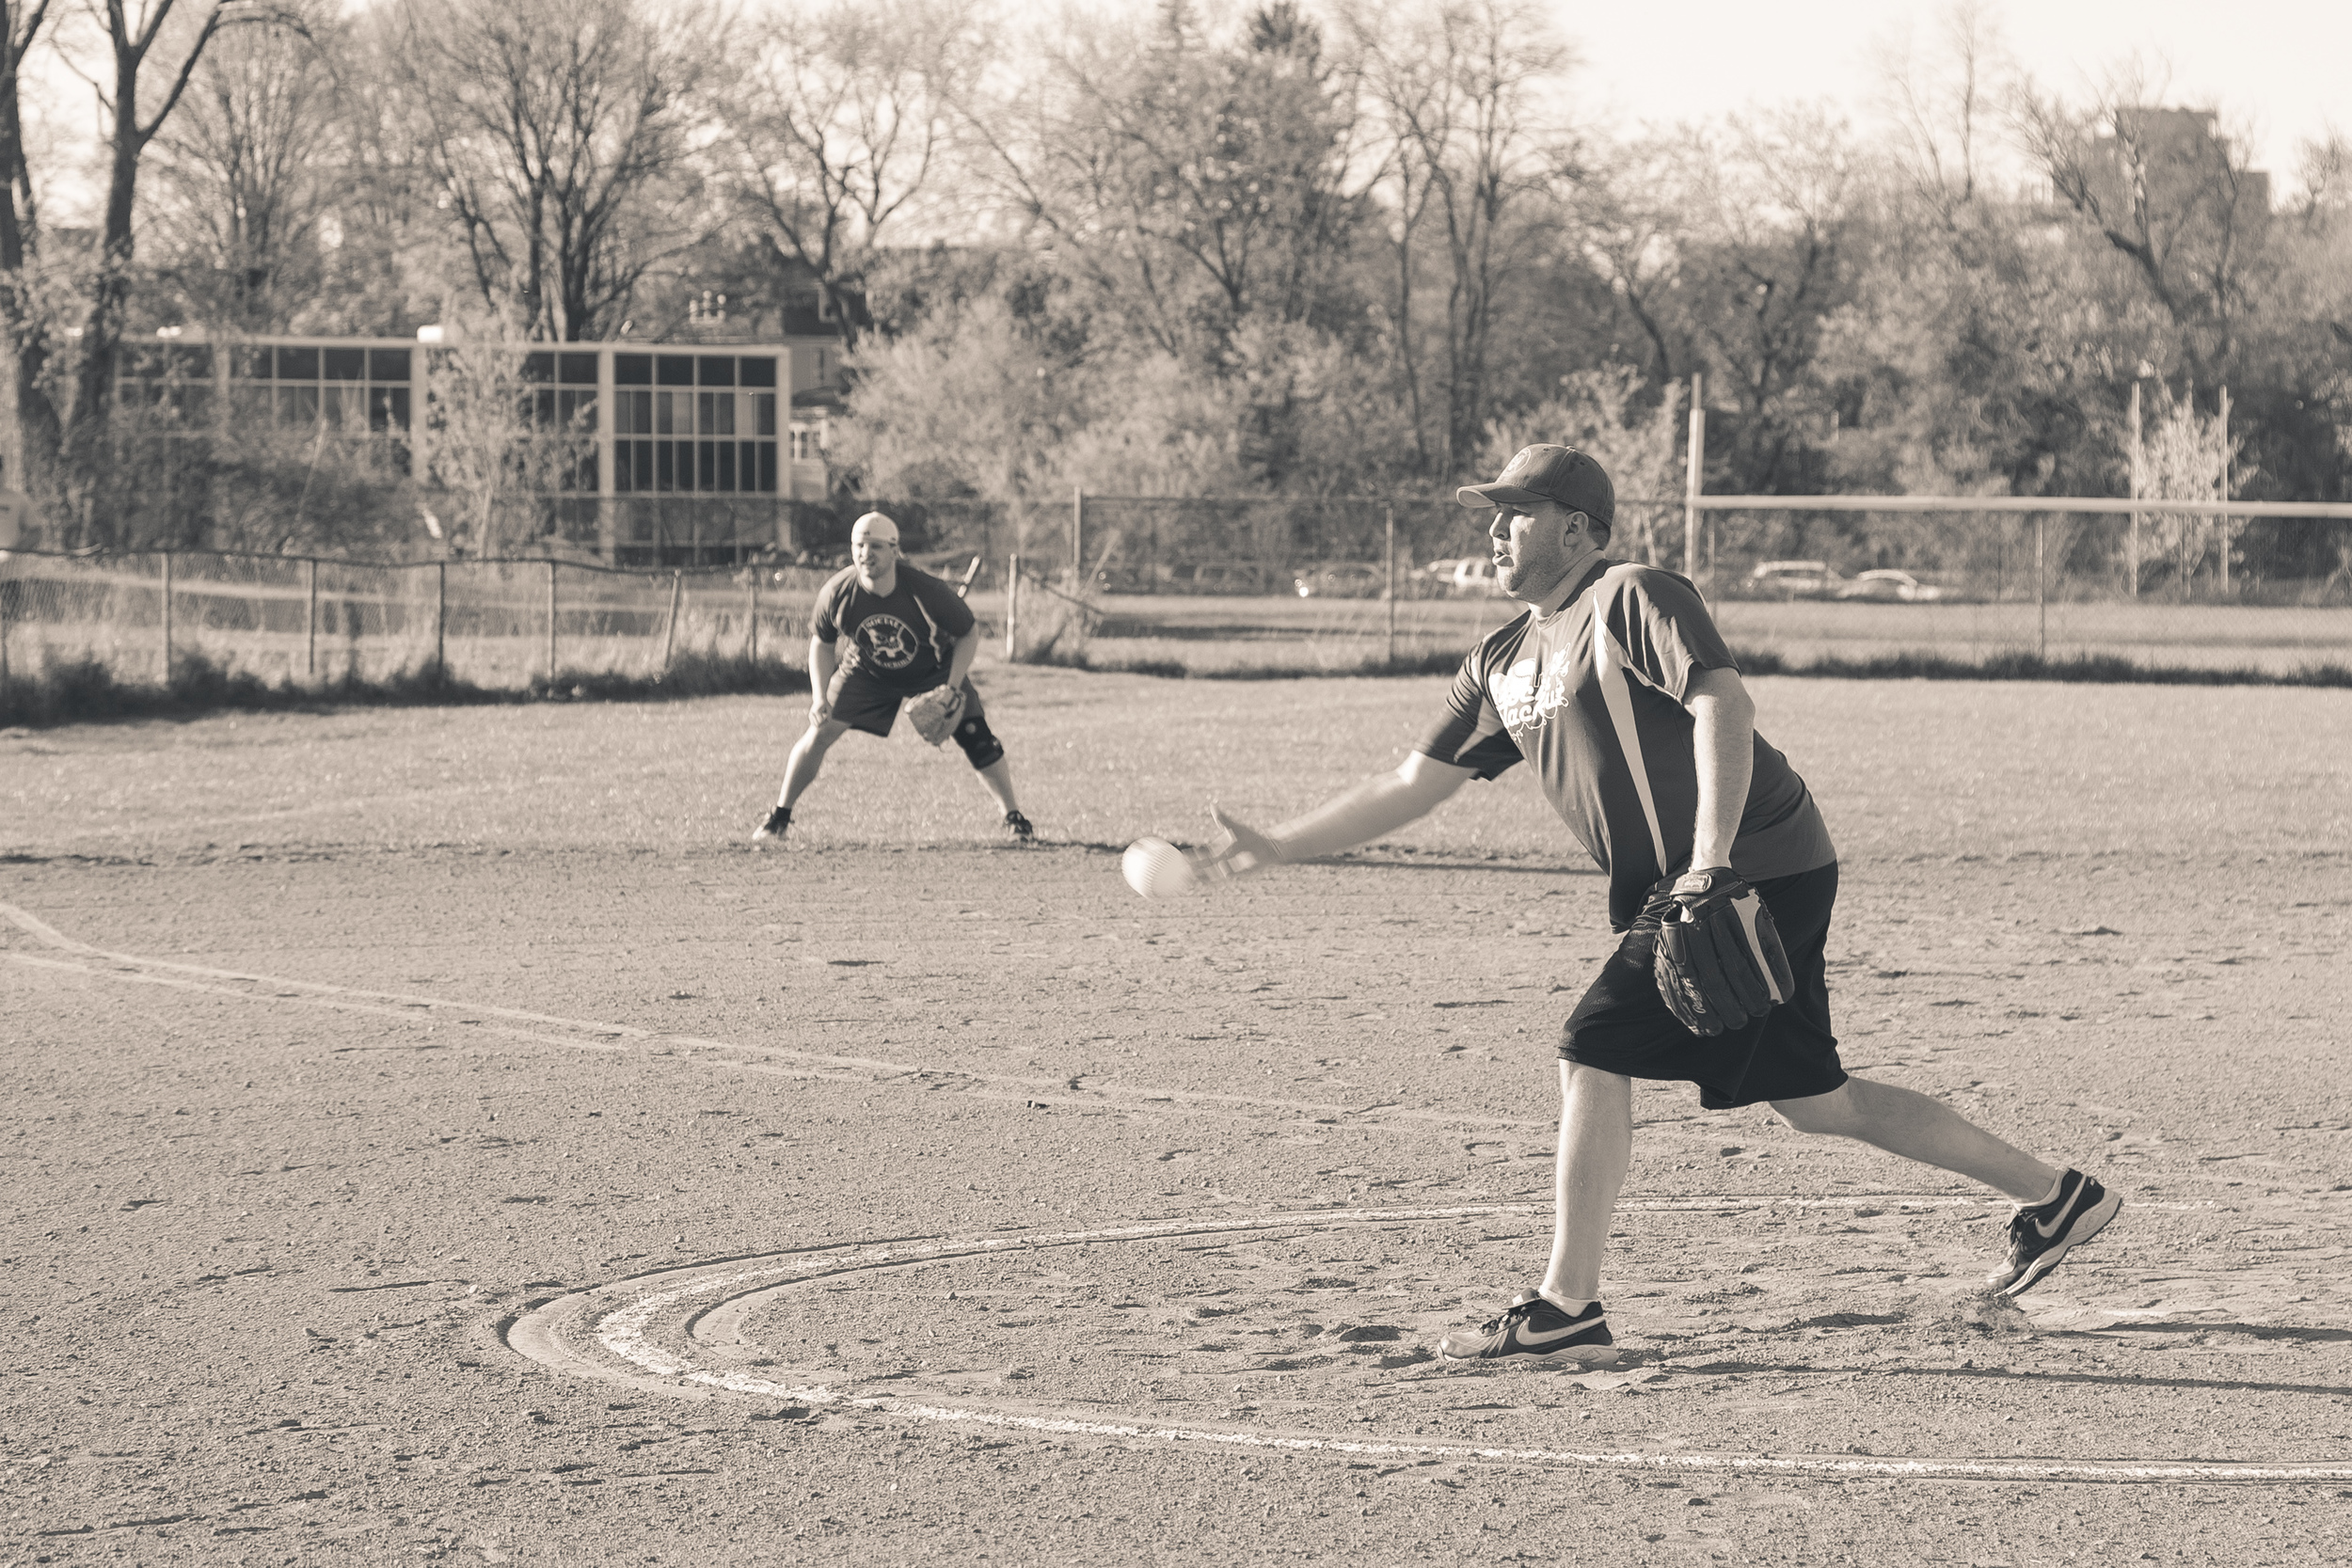 Day 128 - Softball